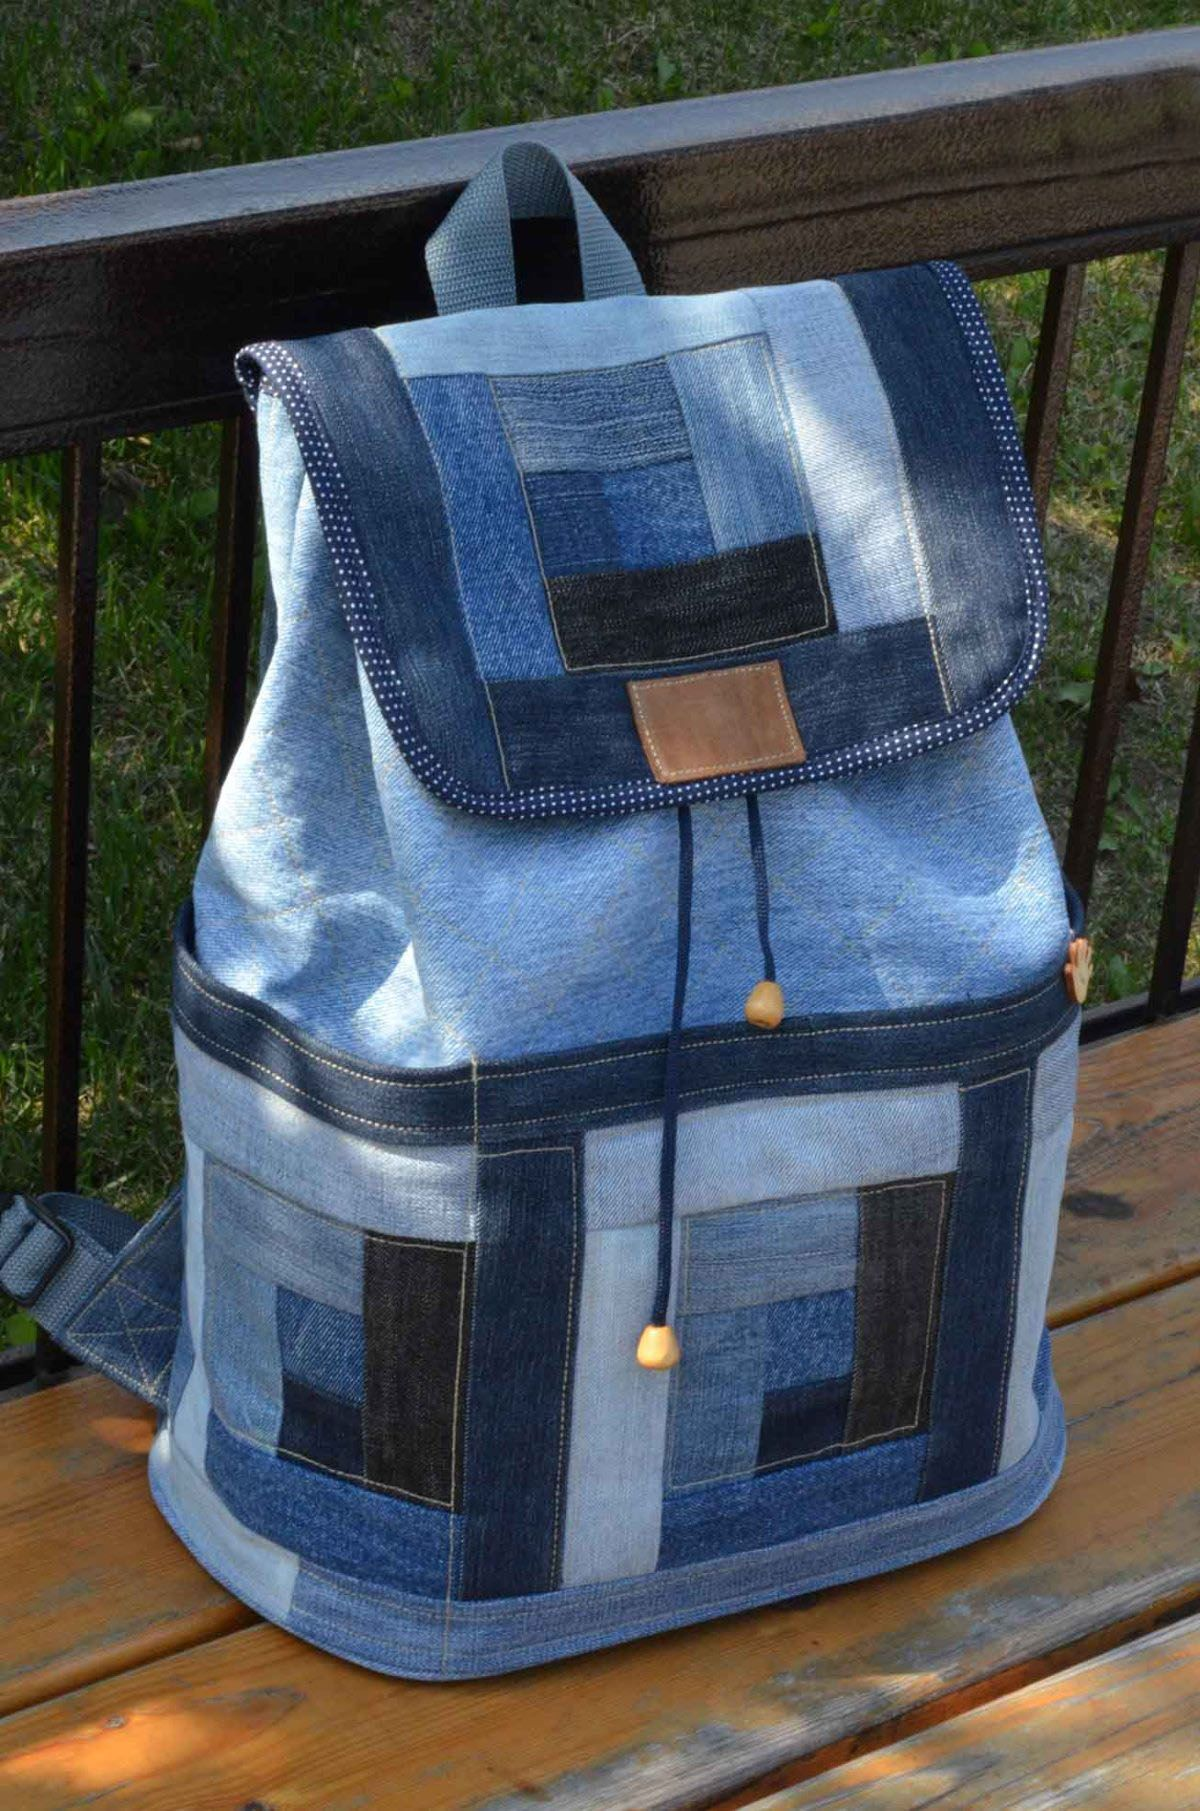 Рюкзак для сменки своими руками фото 57